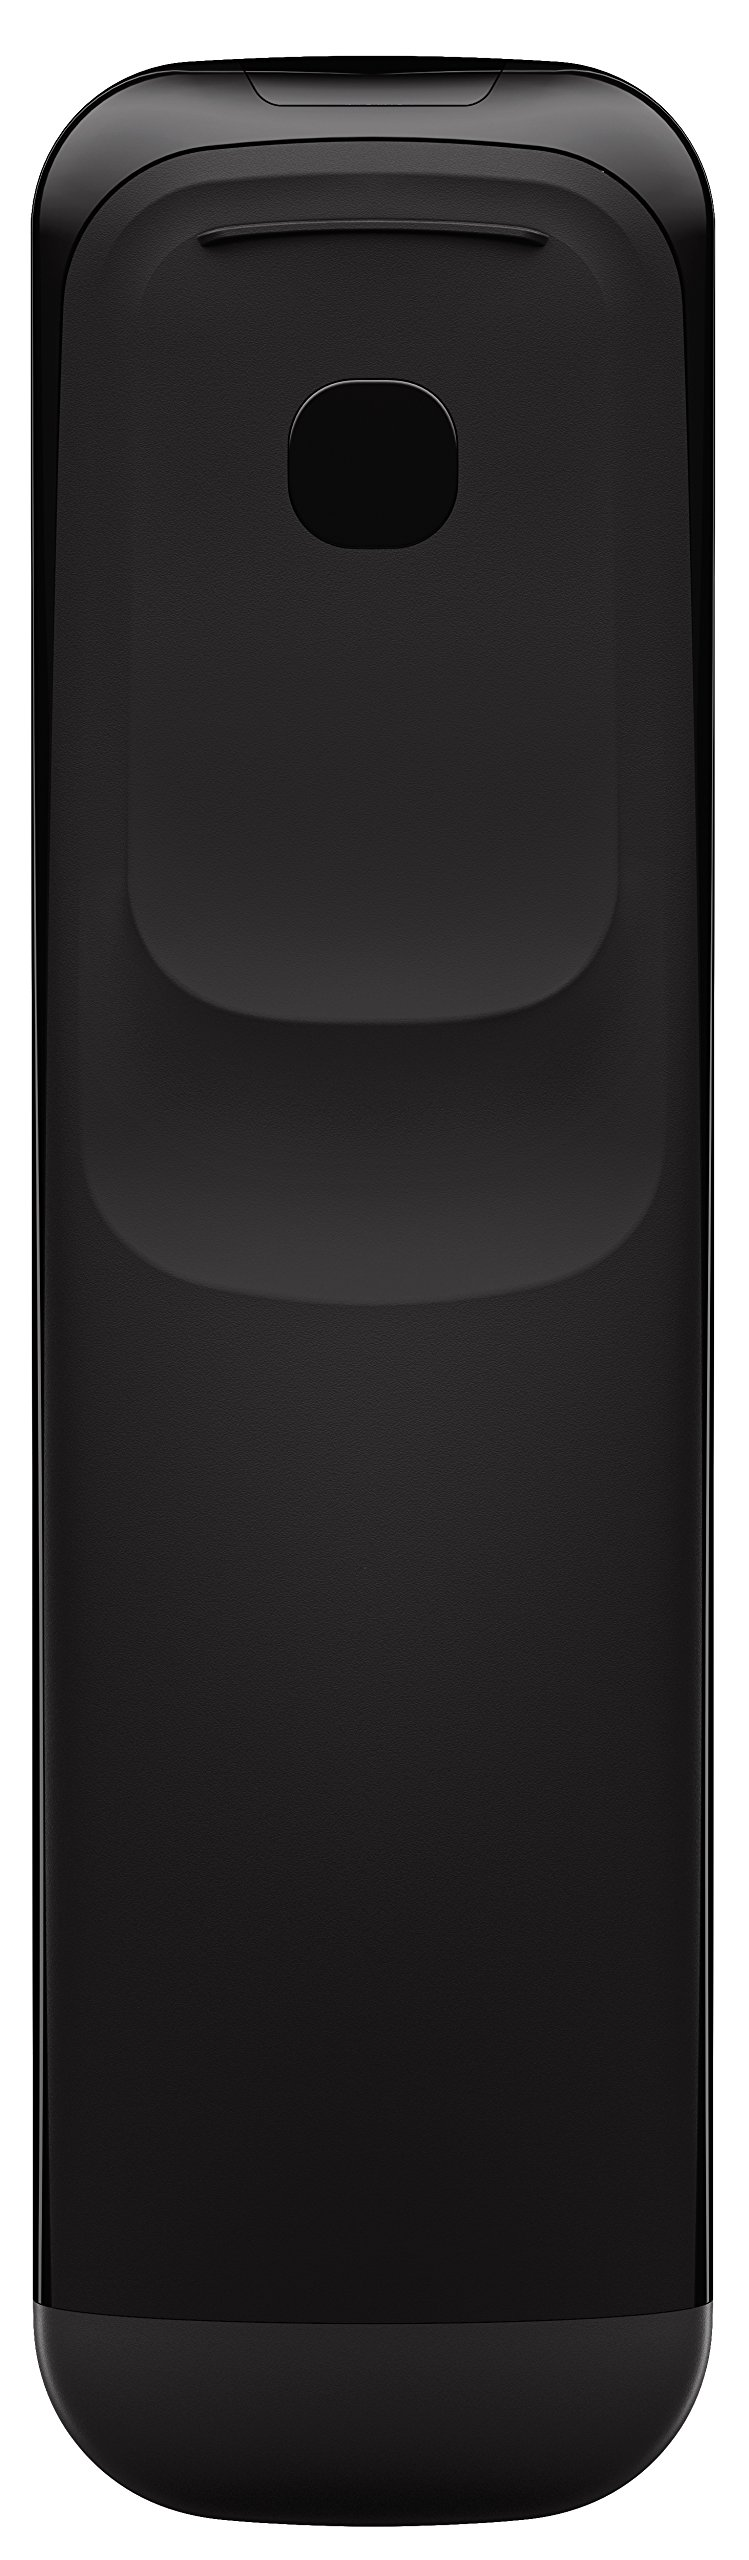 Logitech Harmony Elite Remote Control, Hub & App by Logitech (Image #6)